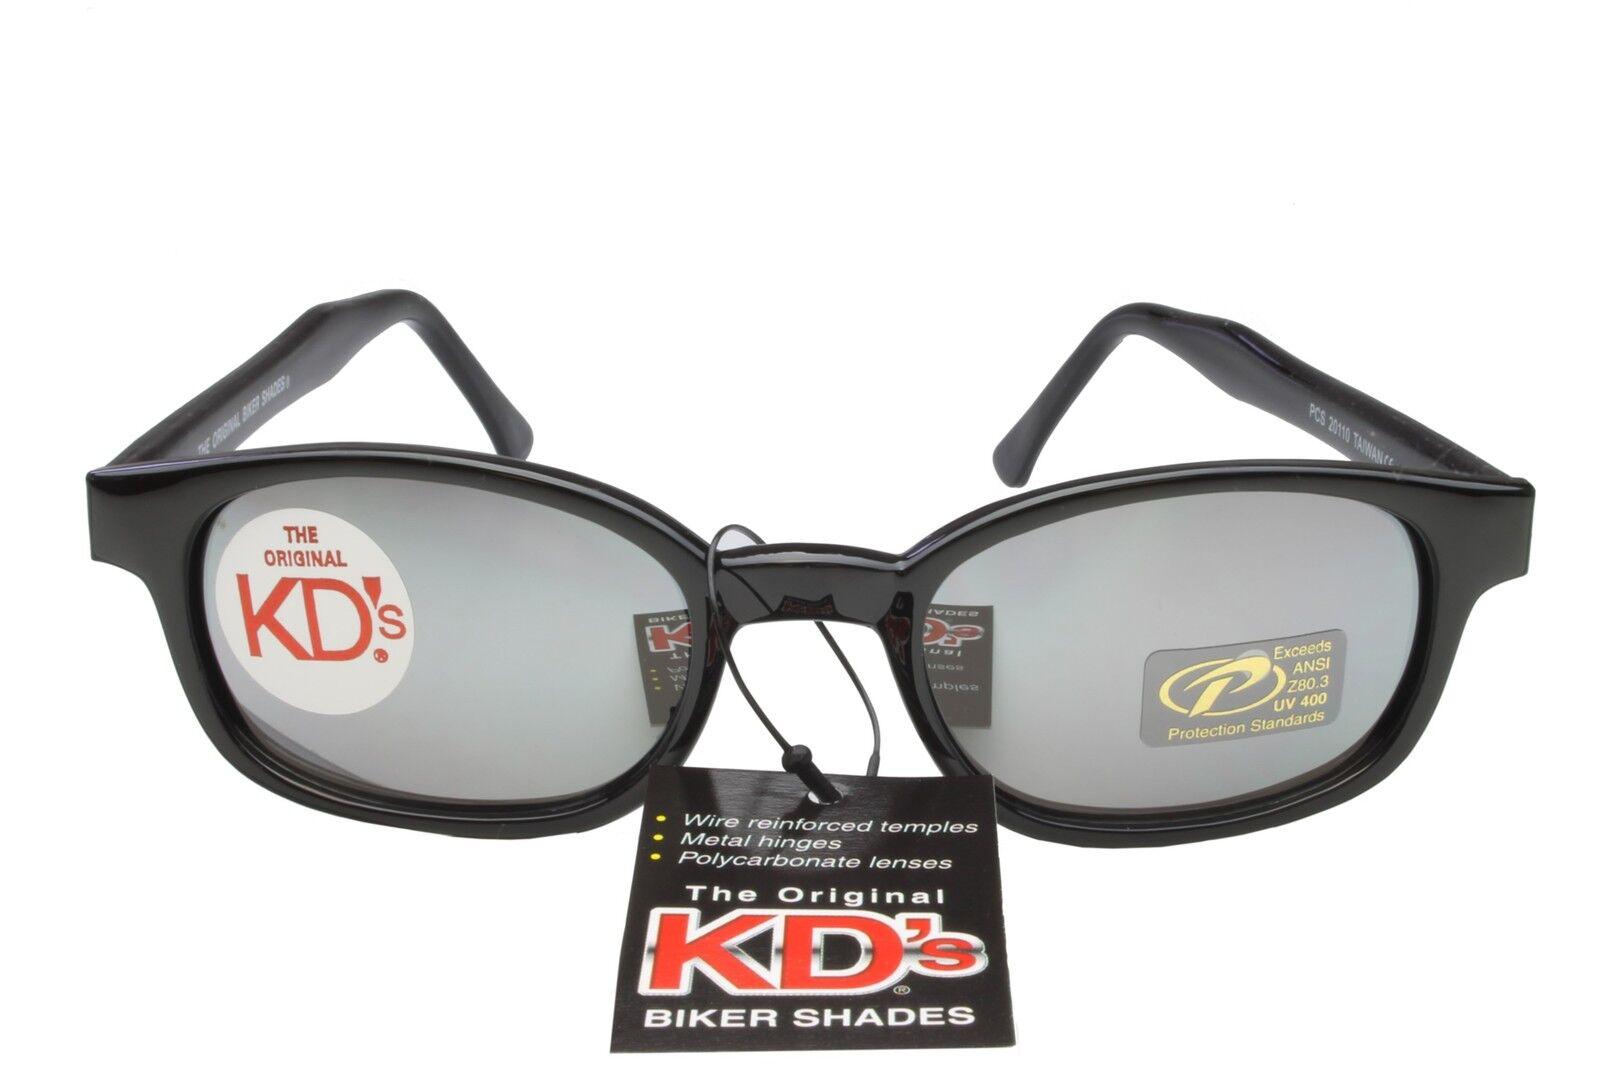 783e78bcc5 KDs Sunglasses Original Biker Shades Motorcycle Black Silver Mirror 20110